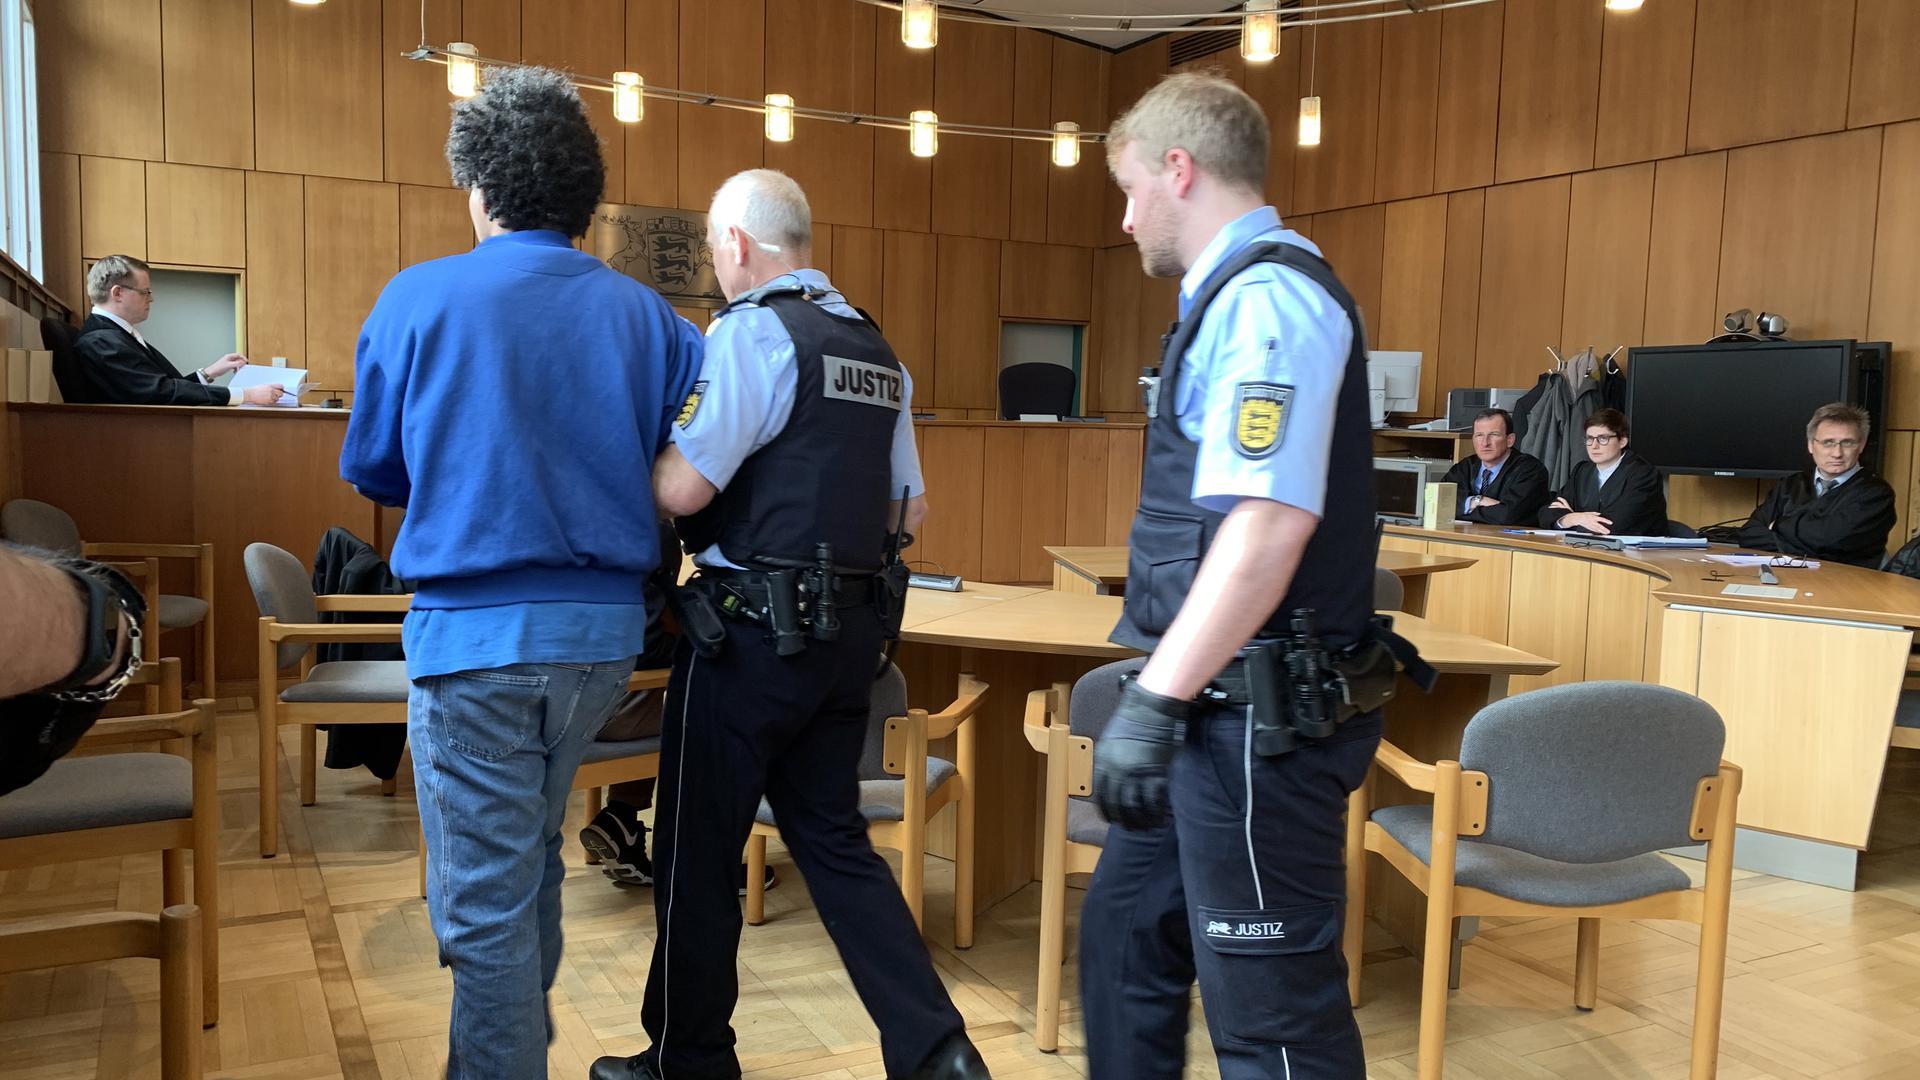 Szene aus dem Gerichtssaal